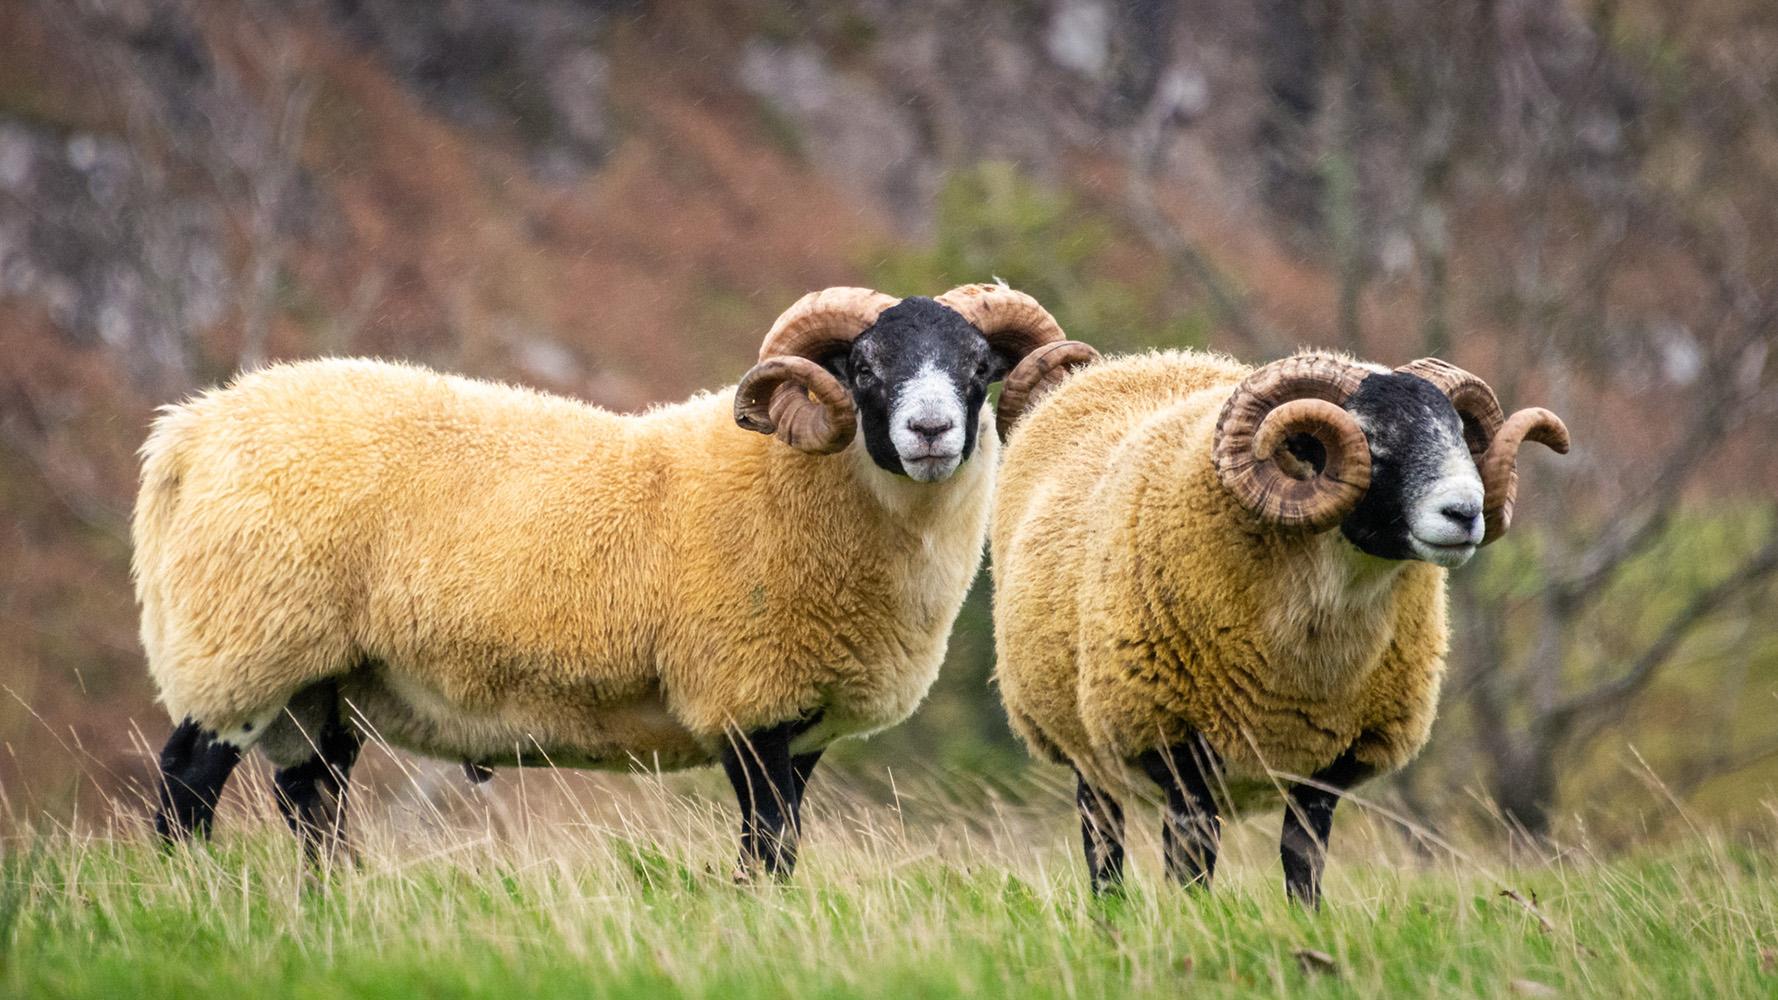 Open_Scottish Blackface Sheep_Esther Andrews_A grade_DPI_Merit